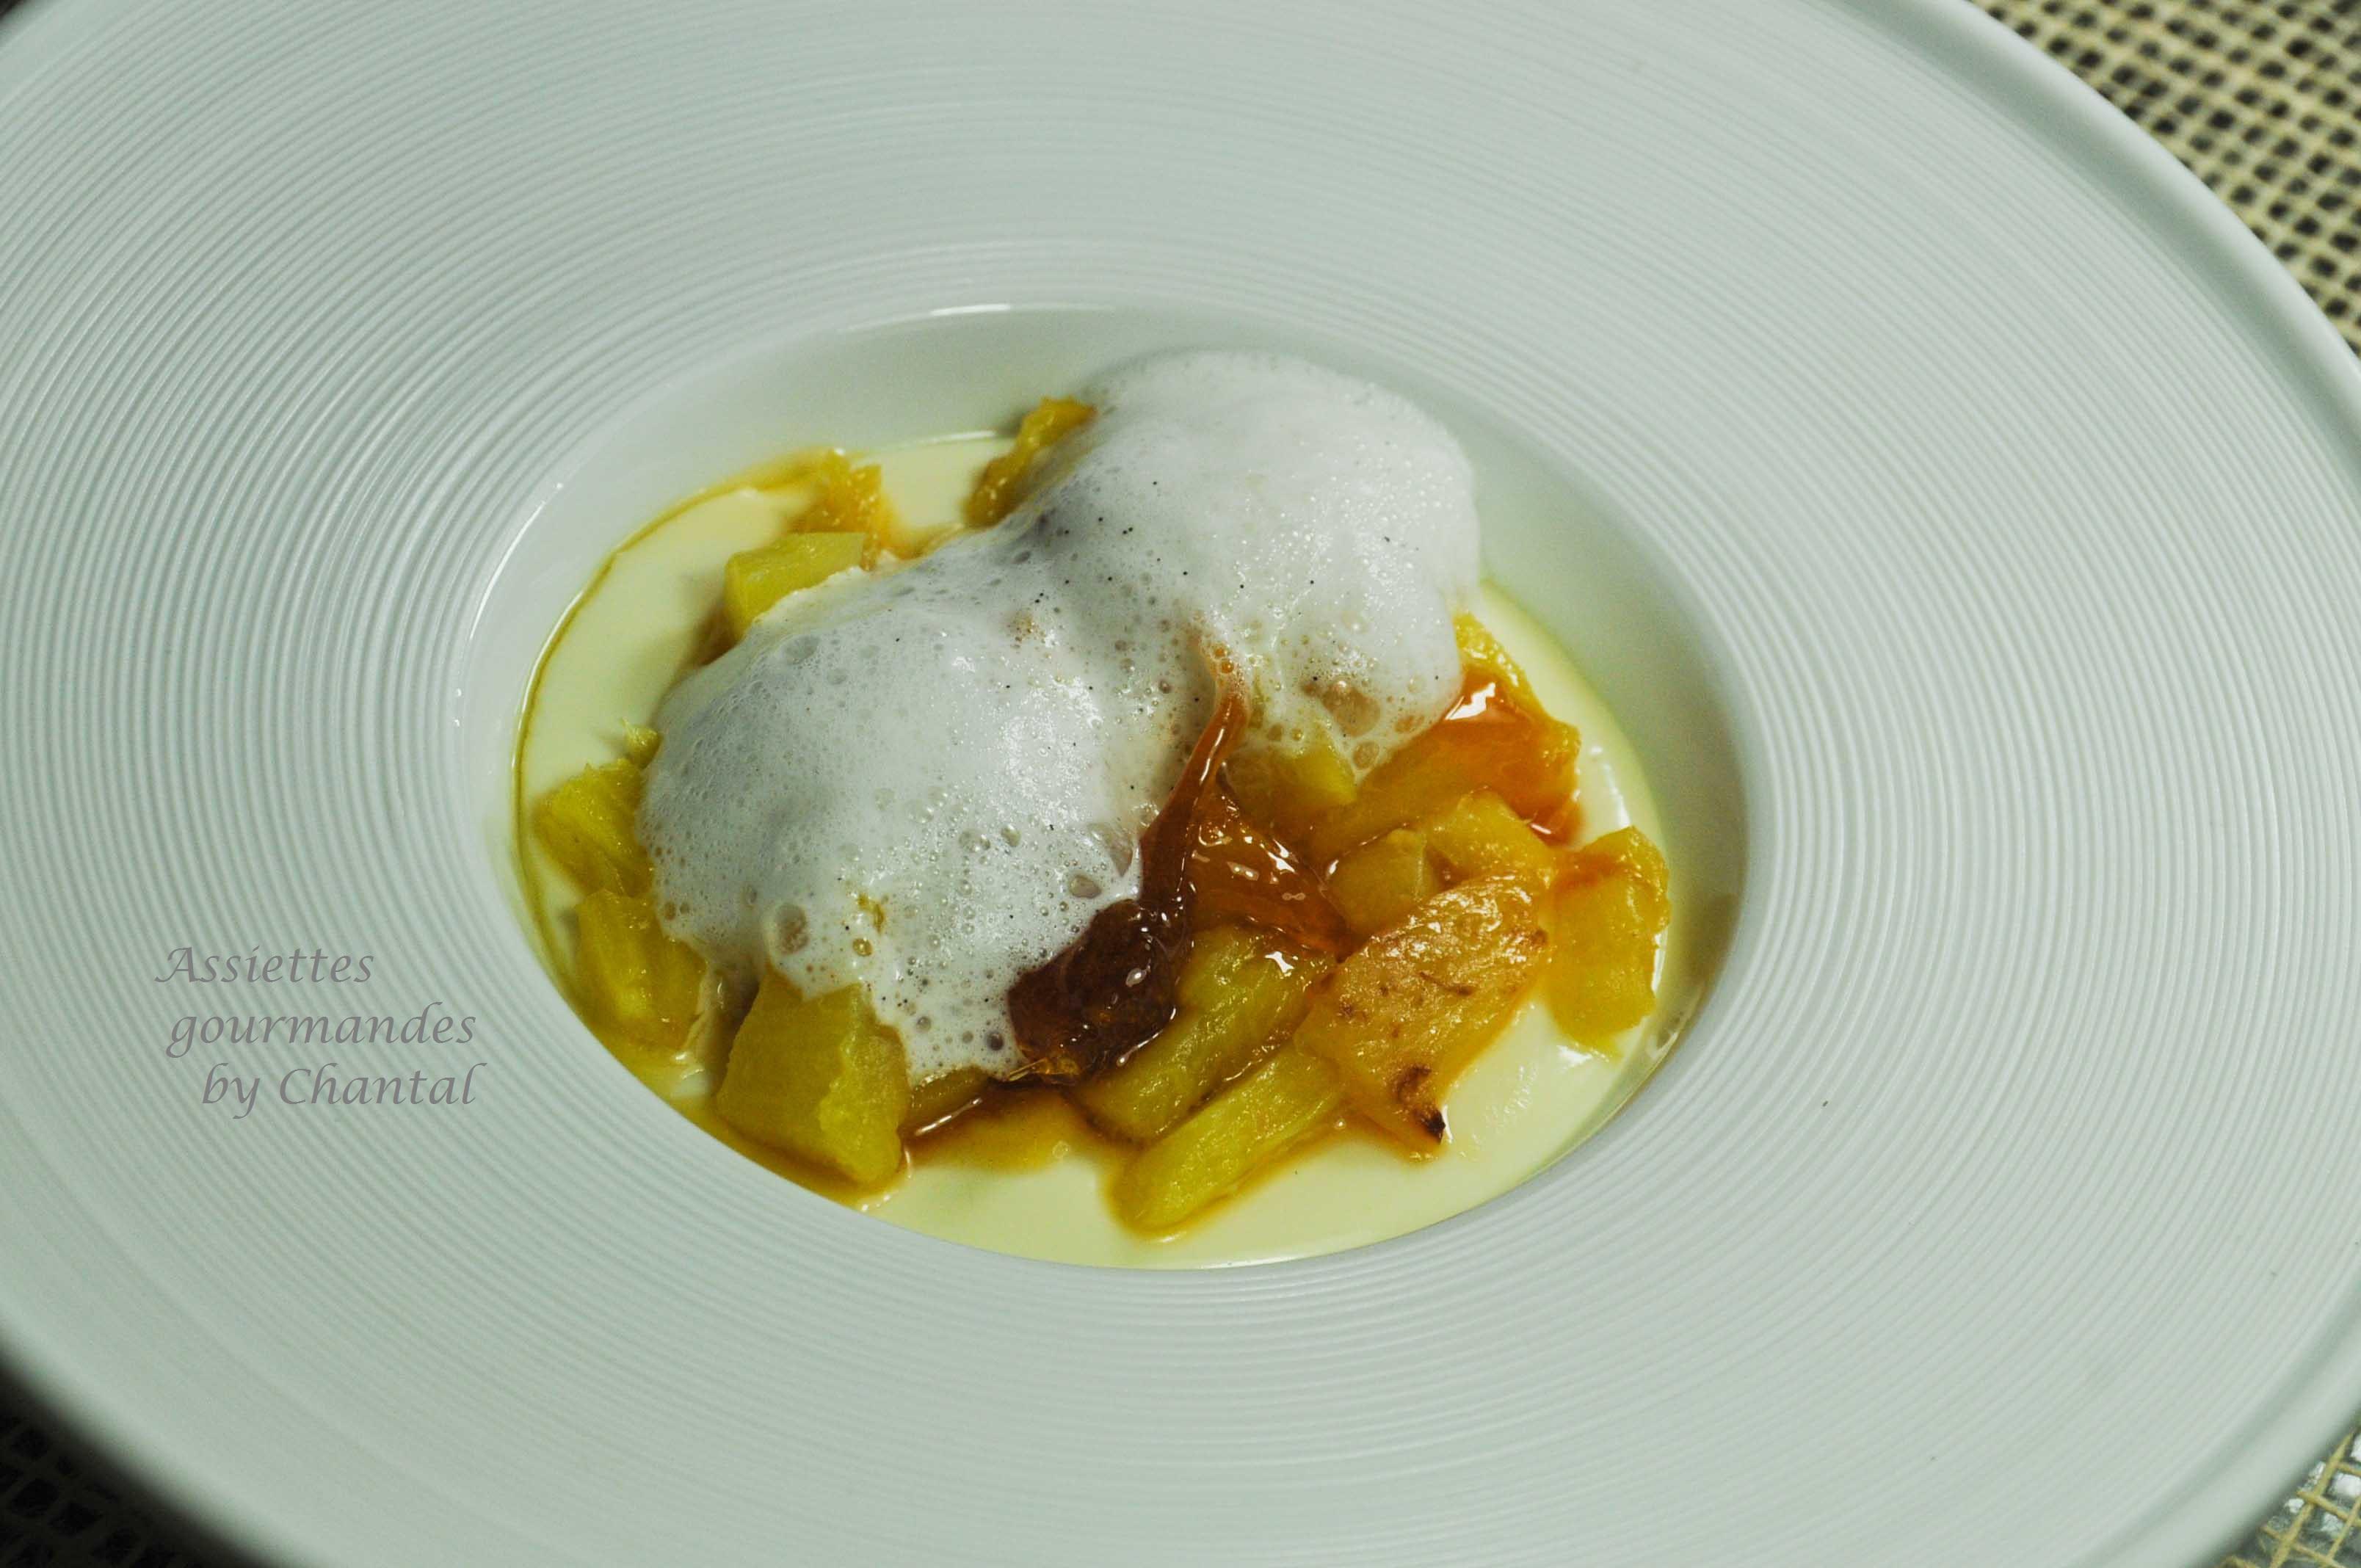 Panna cotta vanille, ananas caramélisé au caramel d'agrumes et émulsion vanille